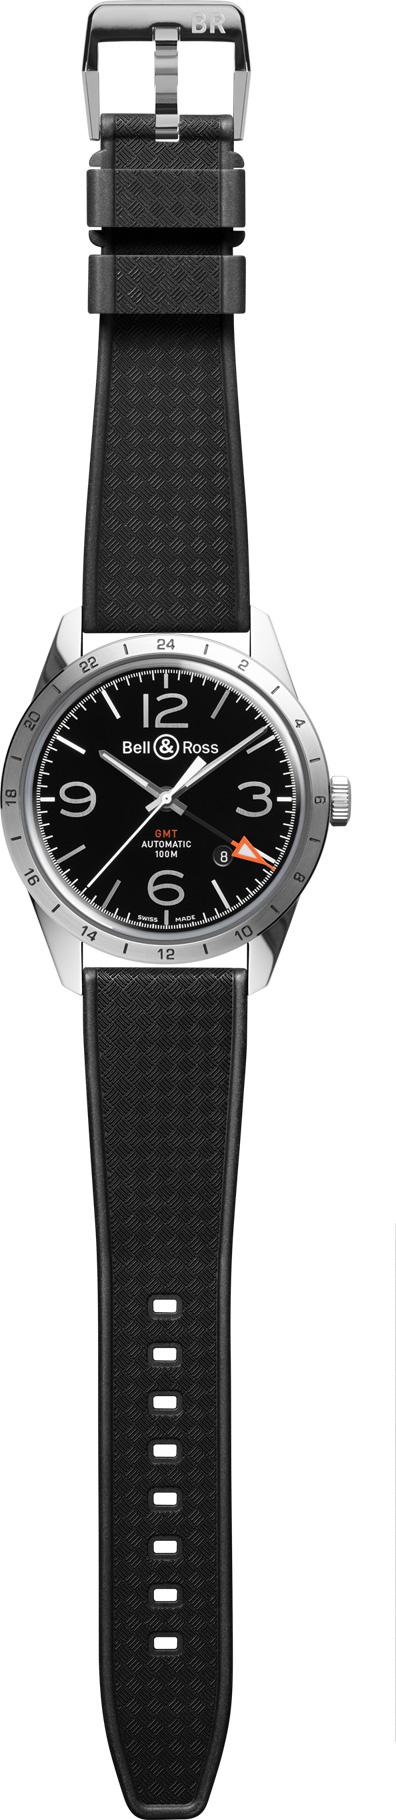 Vintage-BR-123-GMT-Tropic-Strap